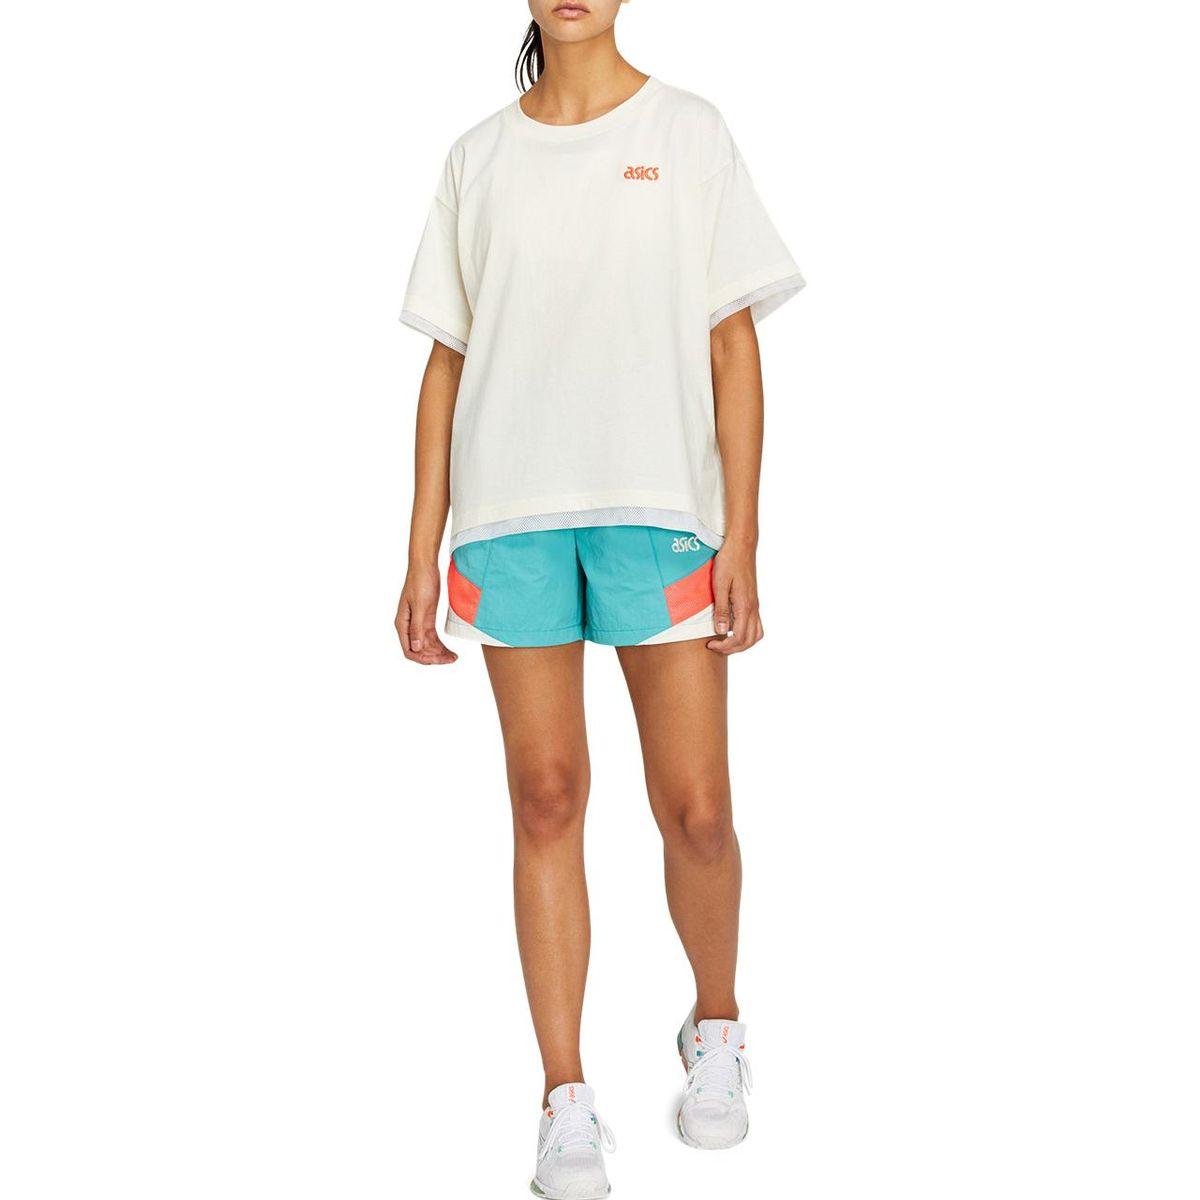 Camiseta-Asics-Breathe-SS-Tee---Feminino---Creme